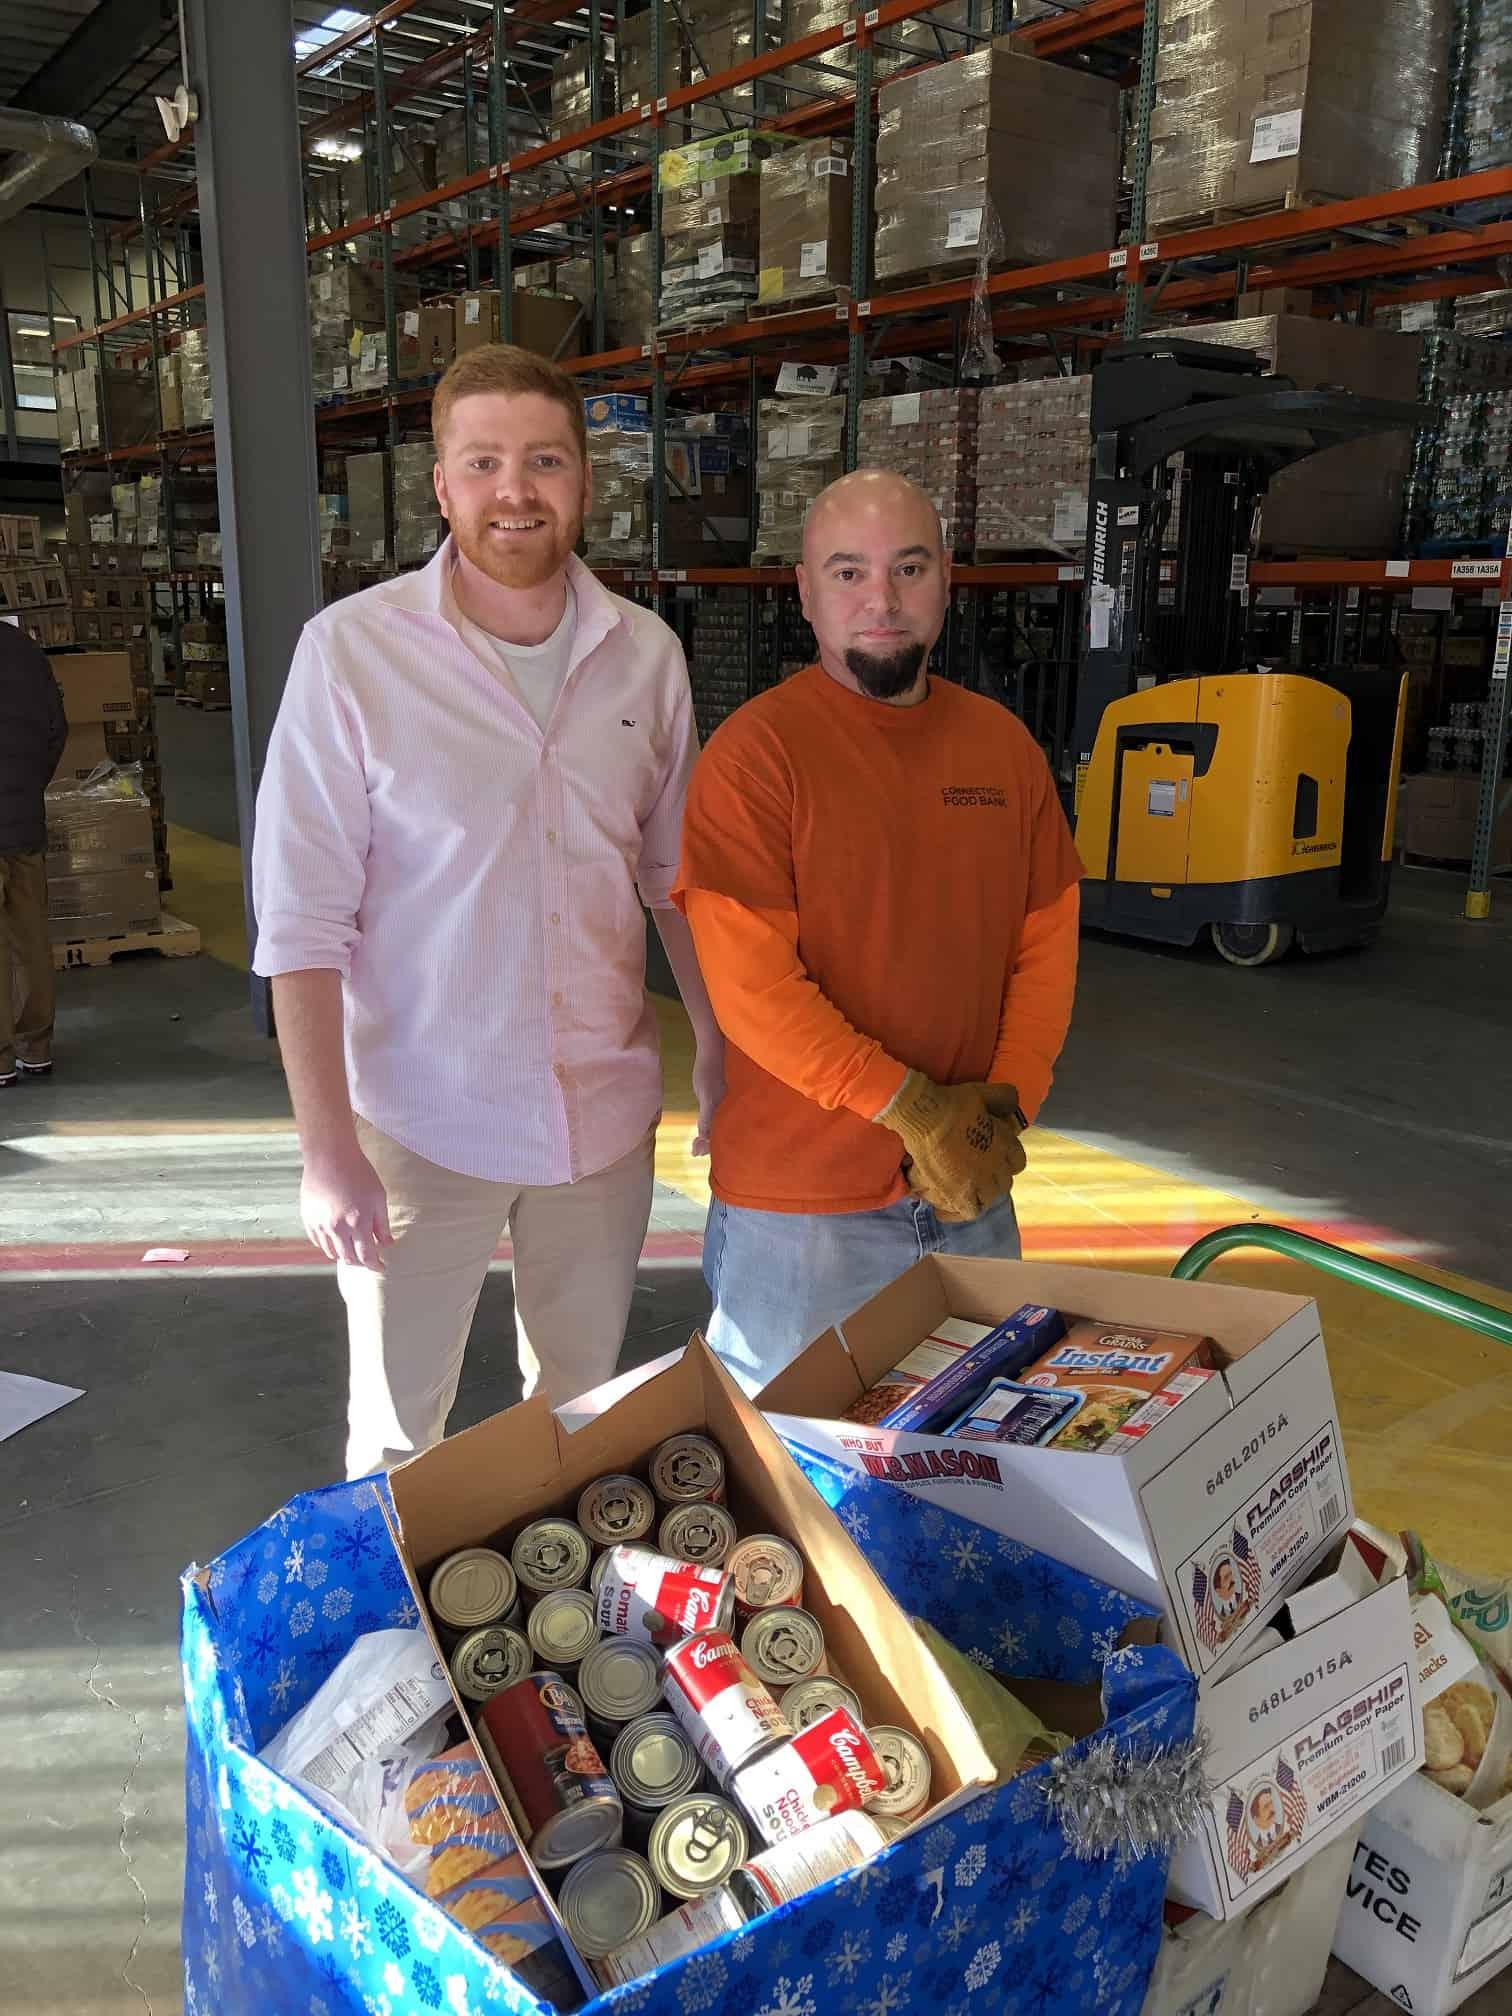 NTL member Jonathan Perkins donates +300 lbs. of food to CT food bank